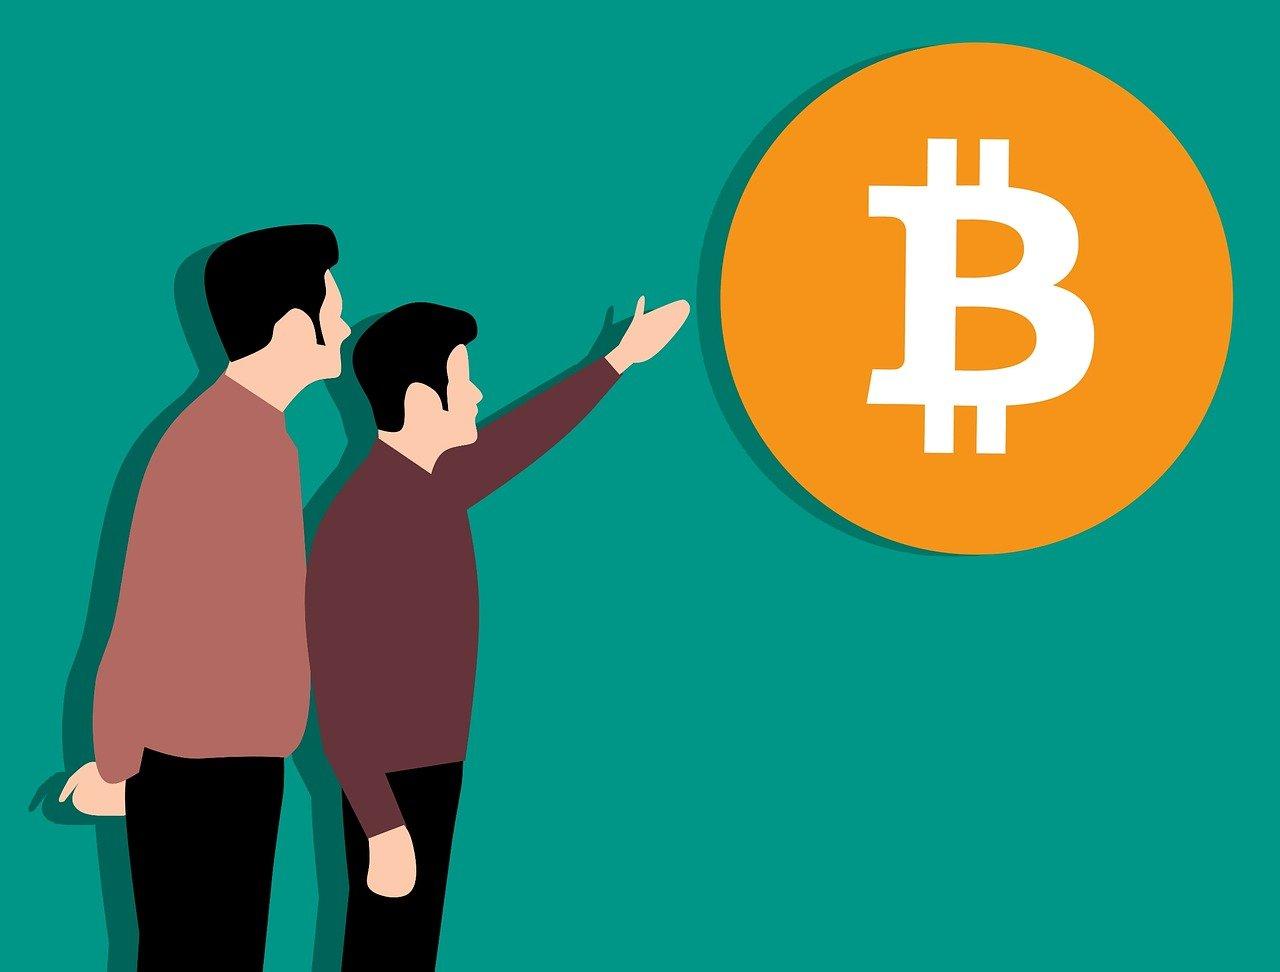 Wells Fargo and JPMorgan Seek To Introduce Bitcoin Funds